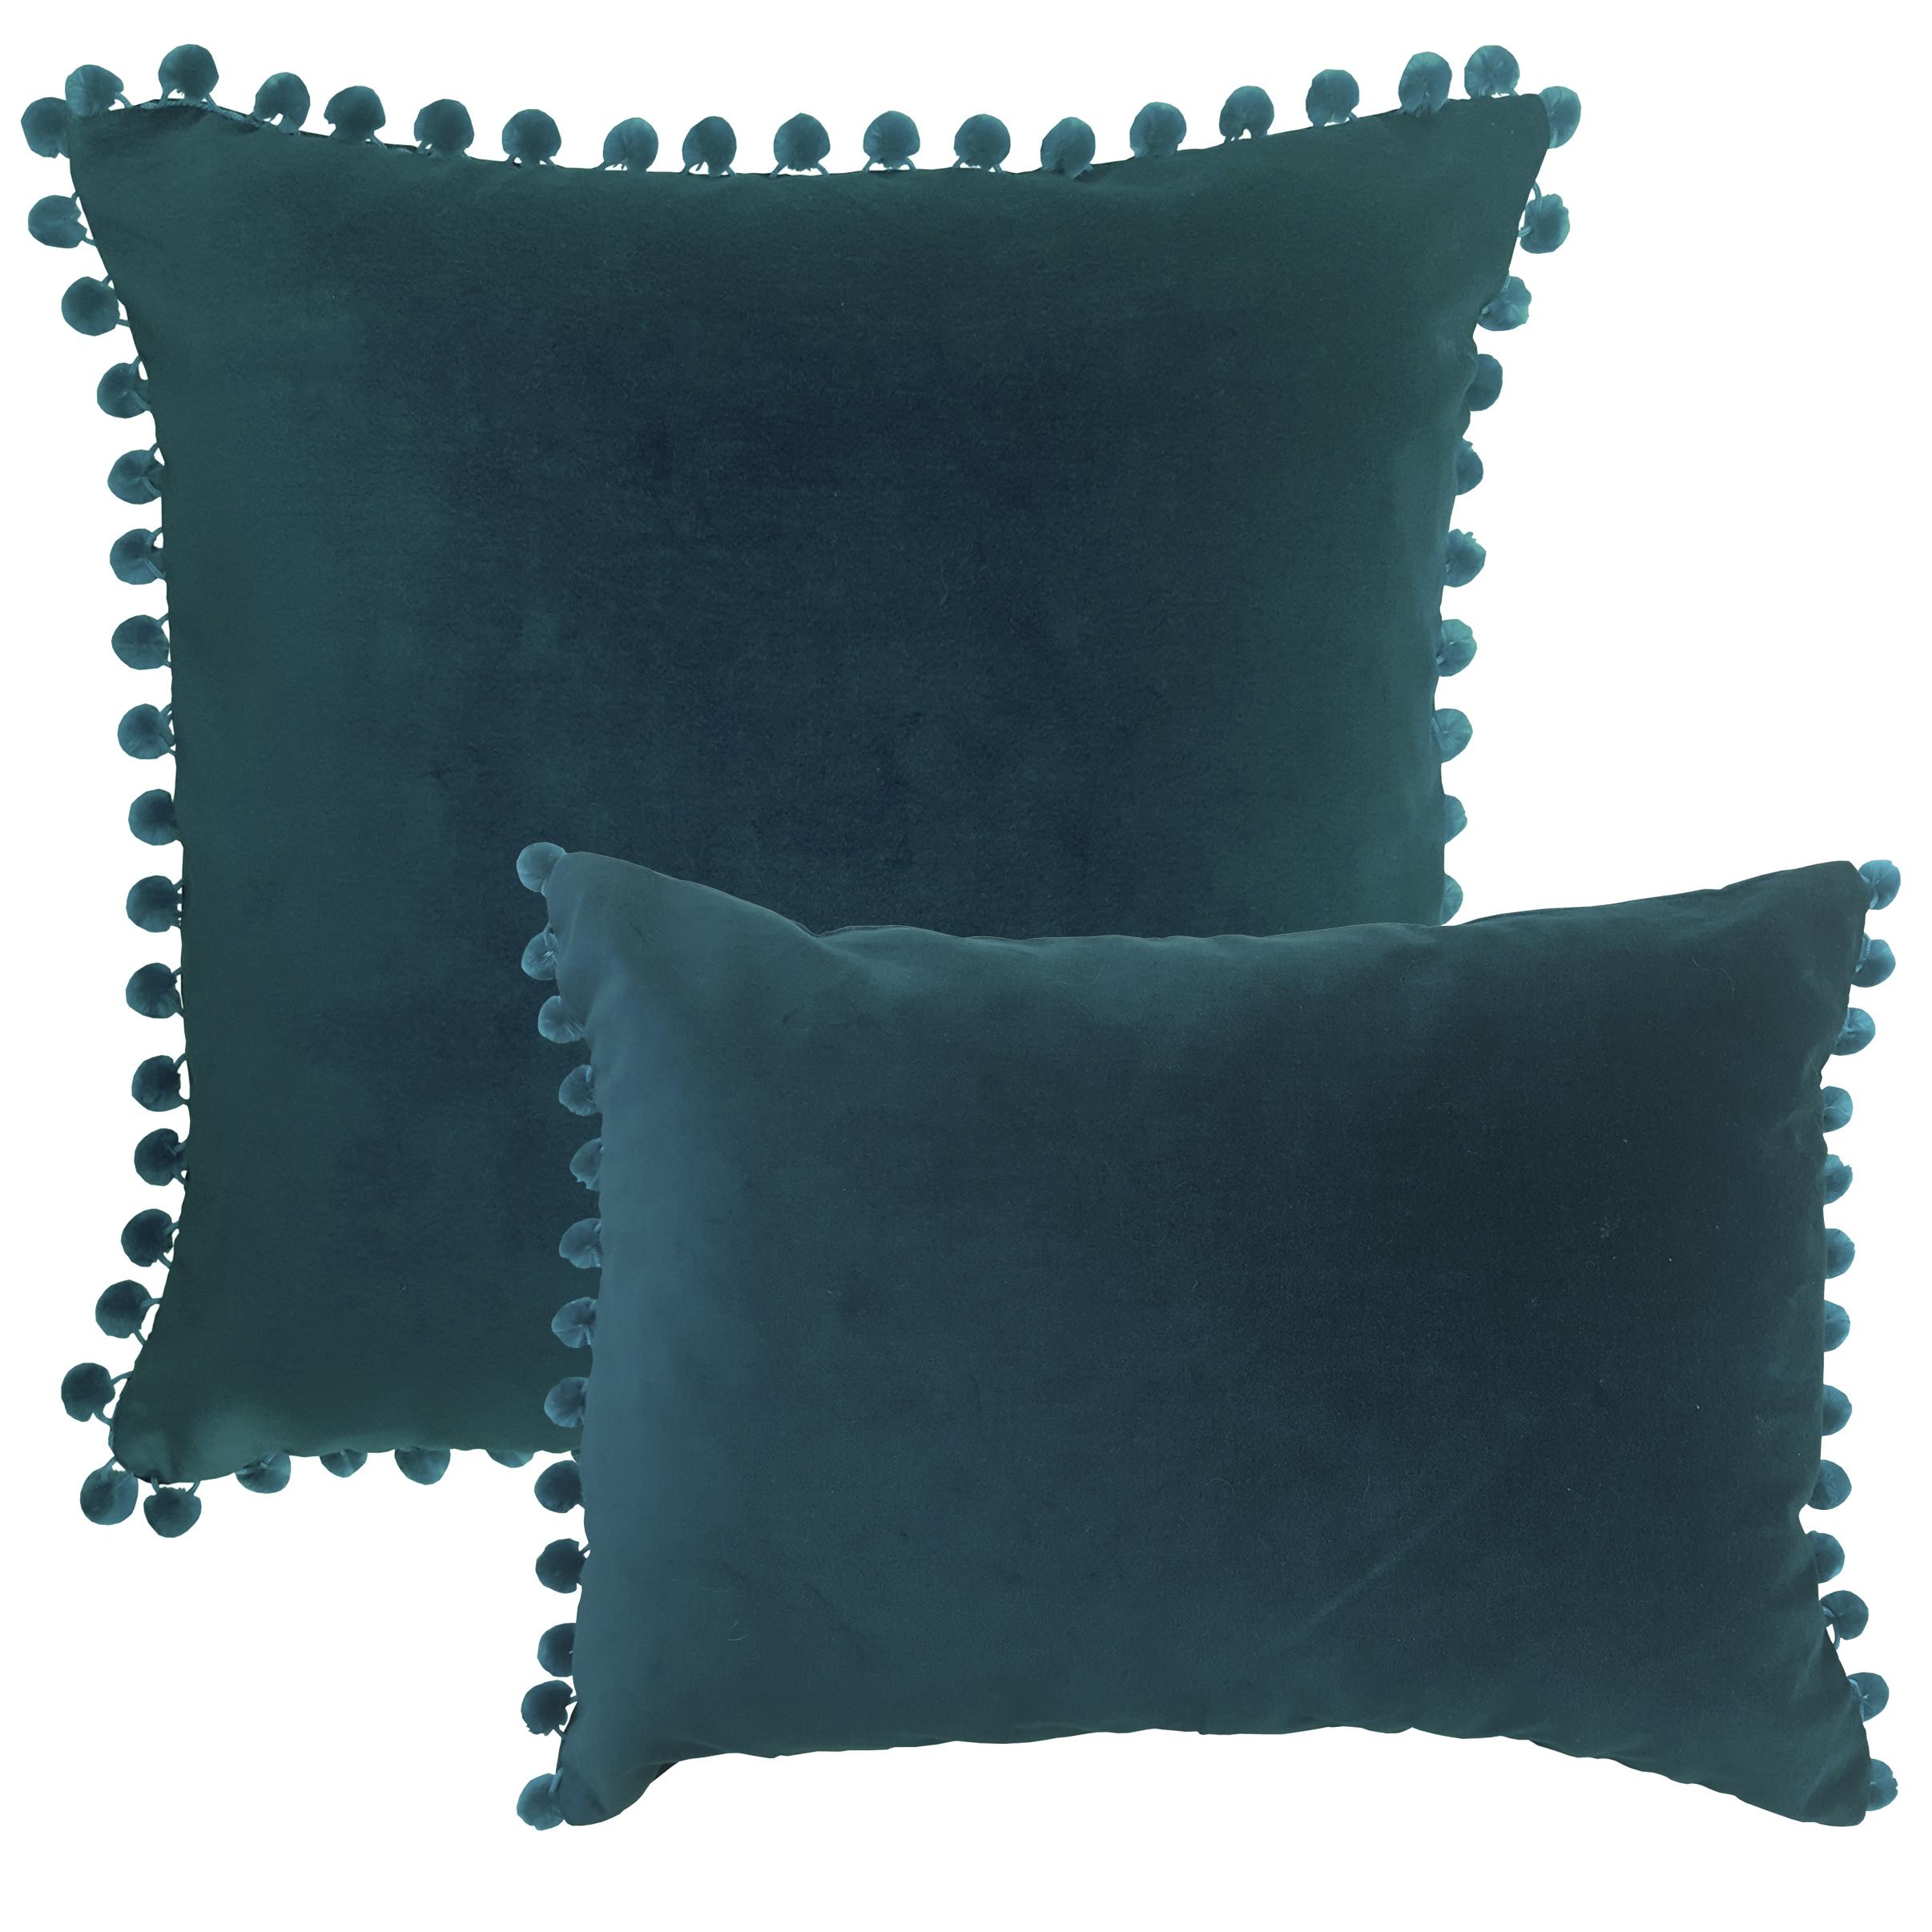 Arabella Petrol Blue Velvet cushions - RAGGED ROSE LTD